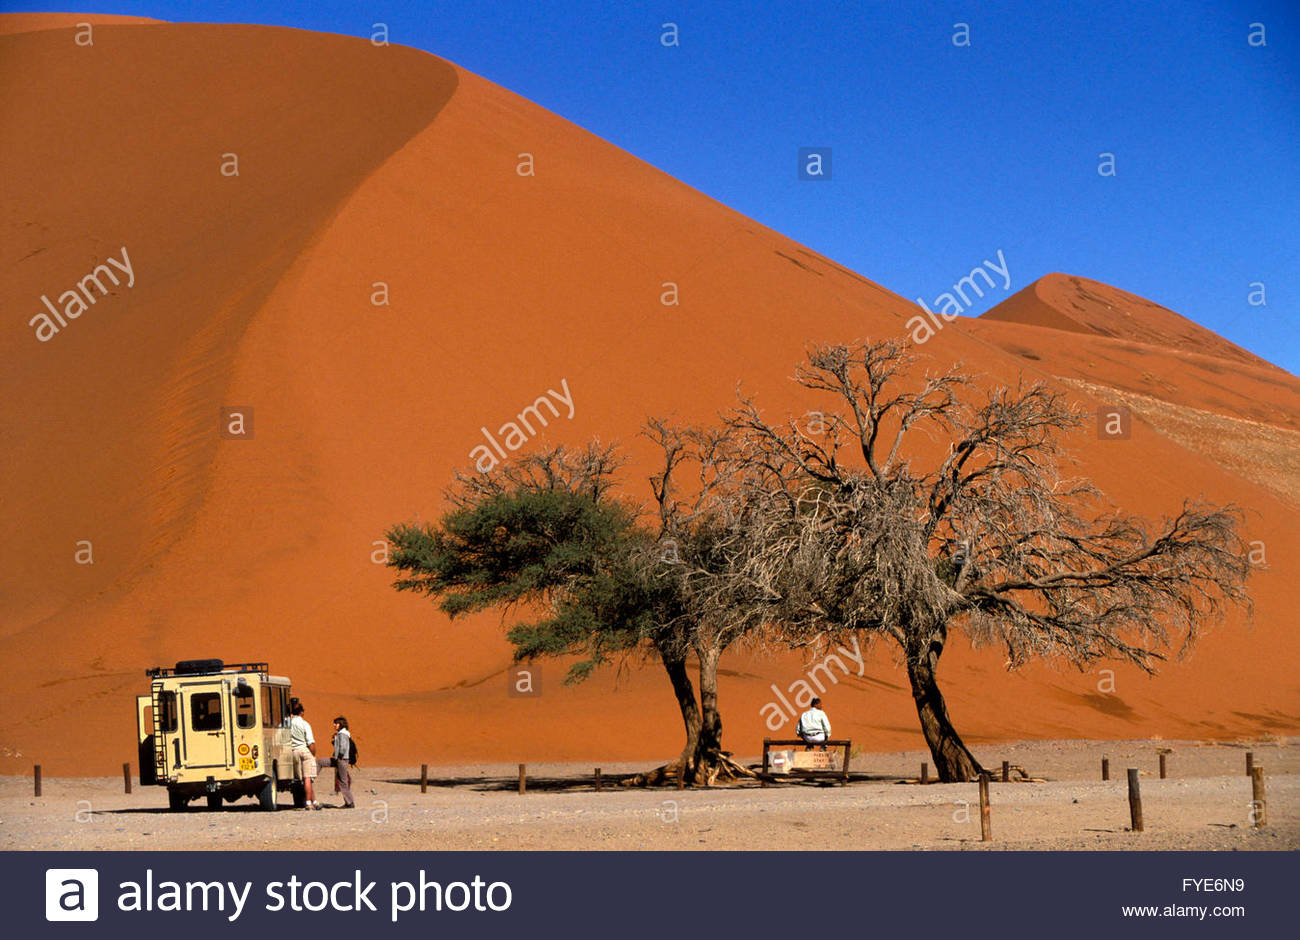 Trees and Sand Dunes in Namib Desert Namibia - Stock Image